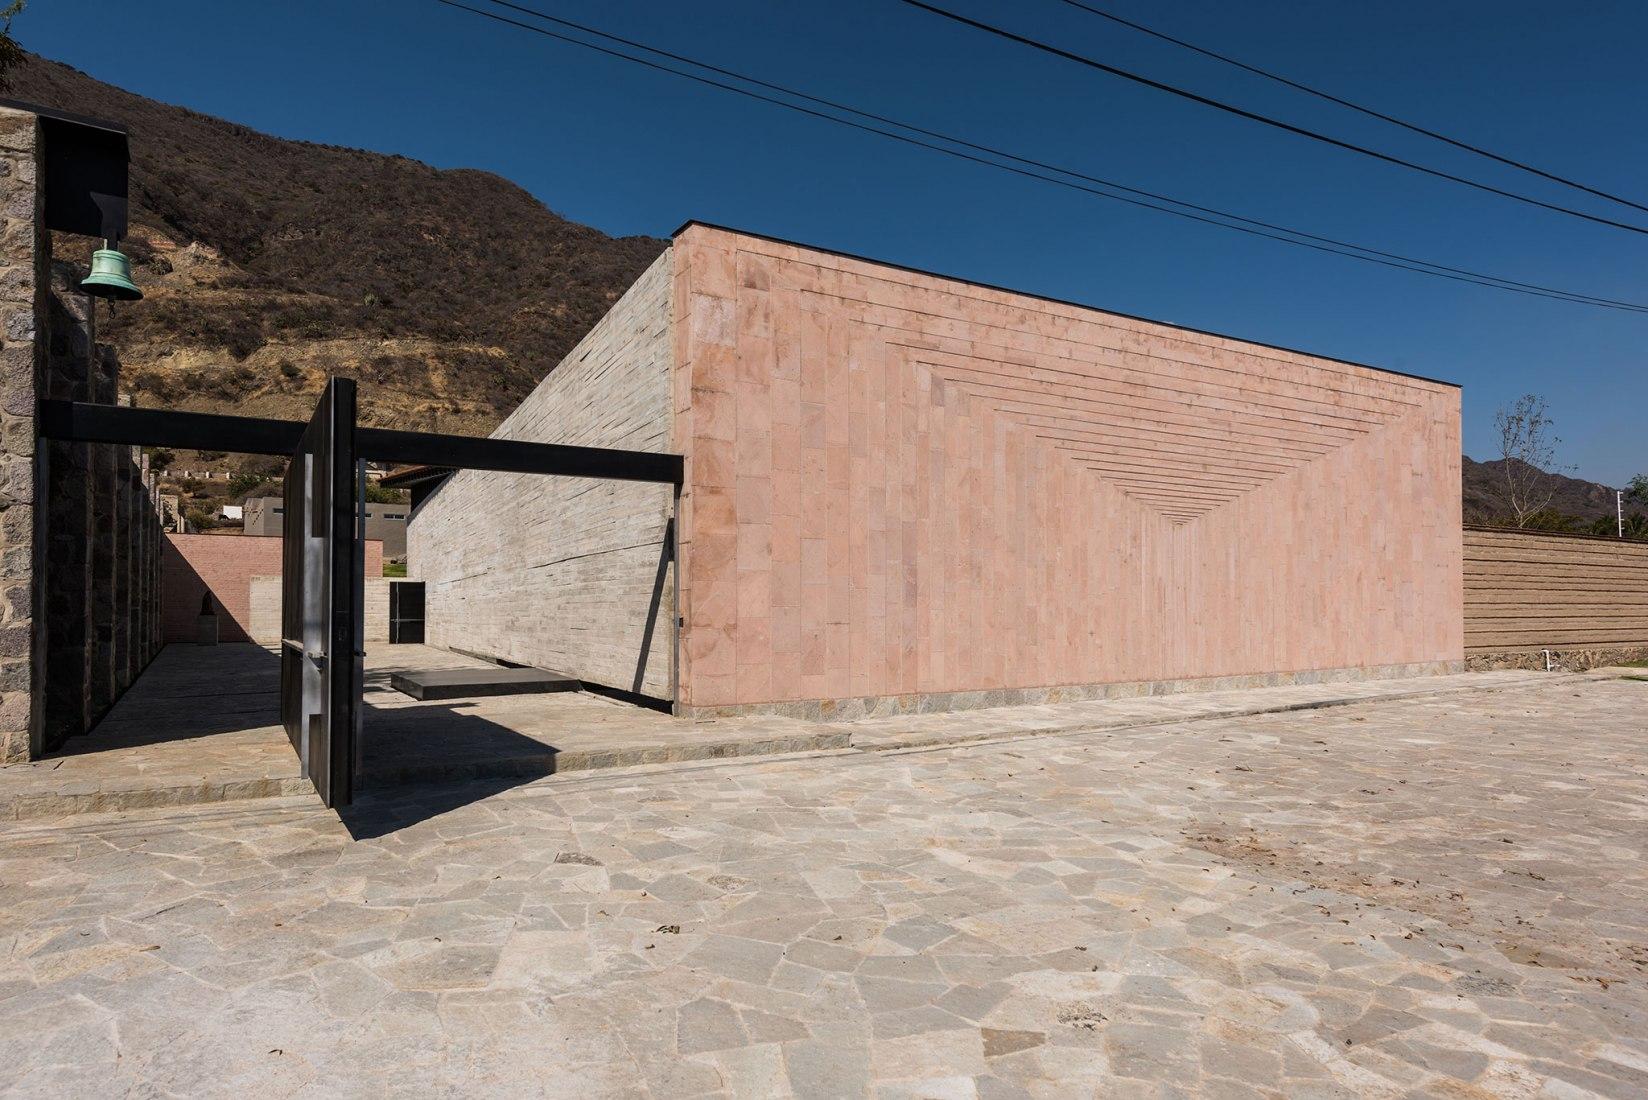 RLJ Chapel by Ricardo Yslas Gámez Arquitectos. Photograph by Jaime Navarro Soto